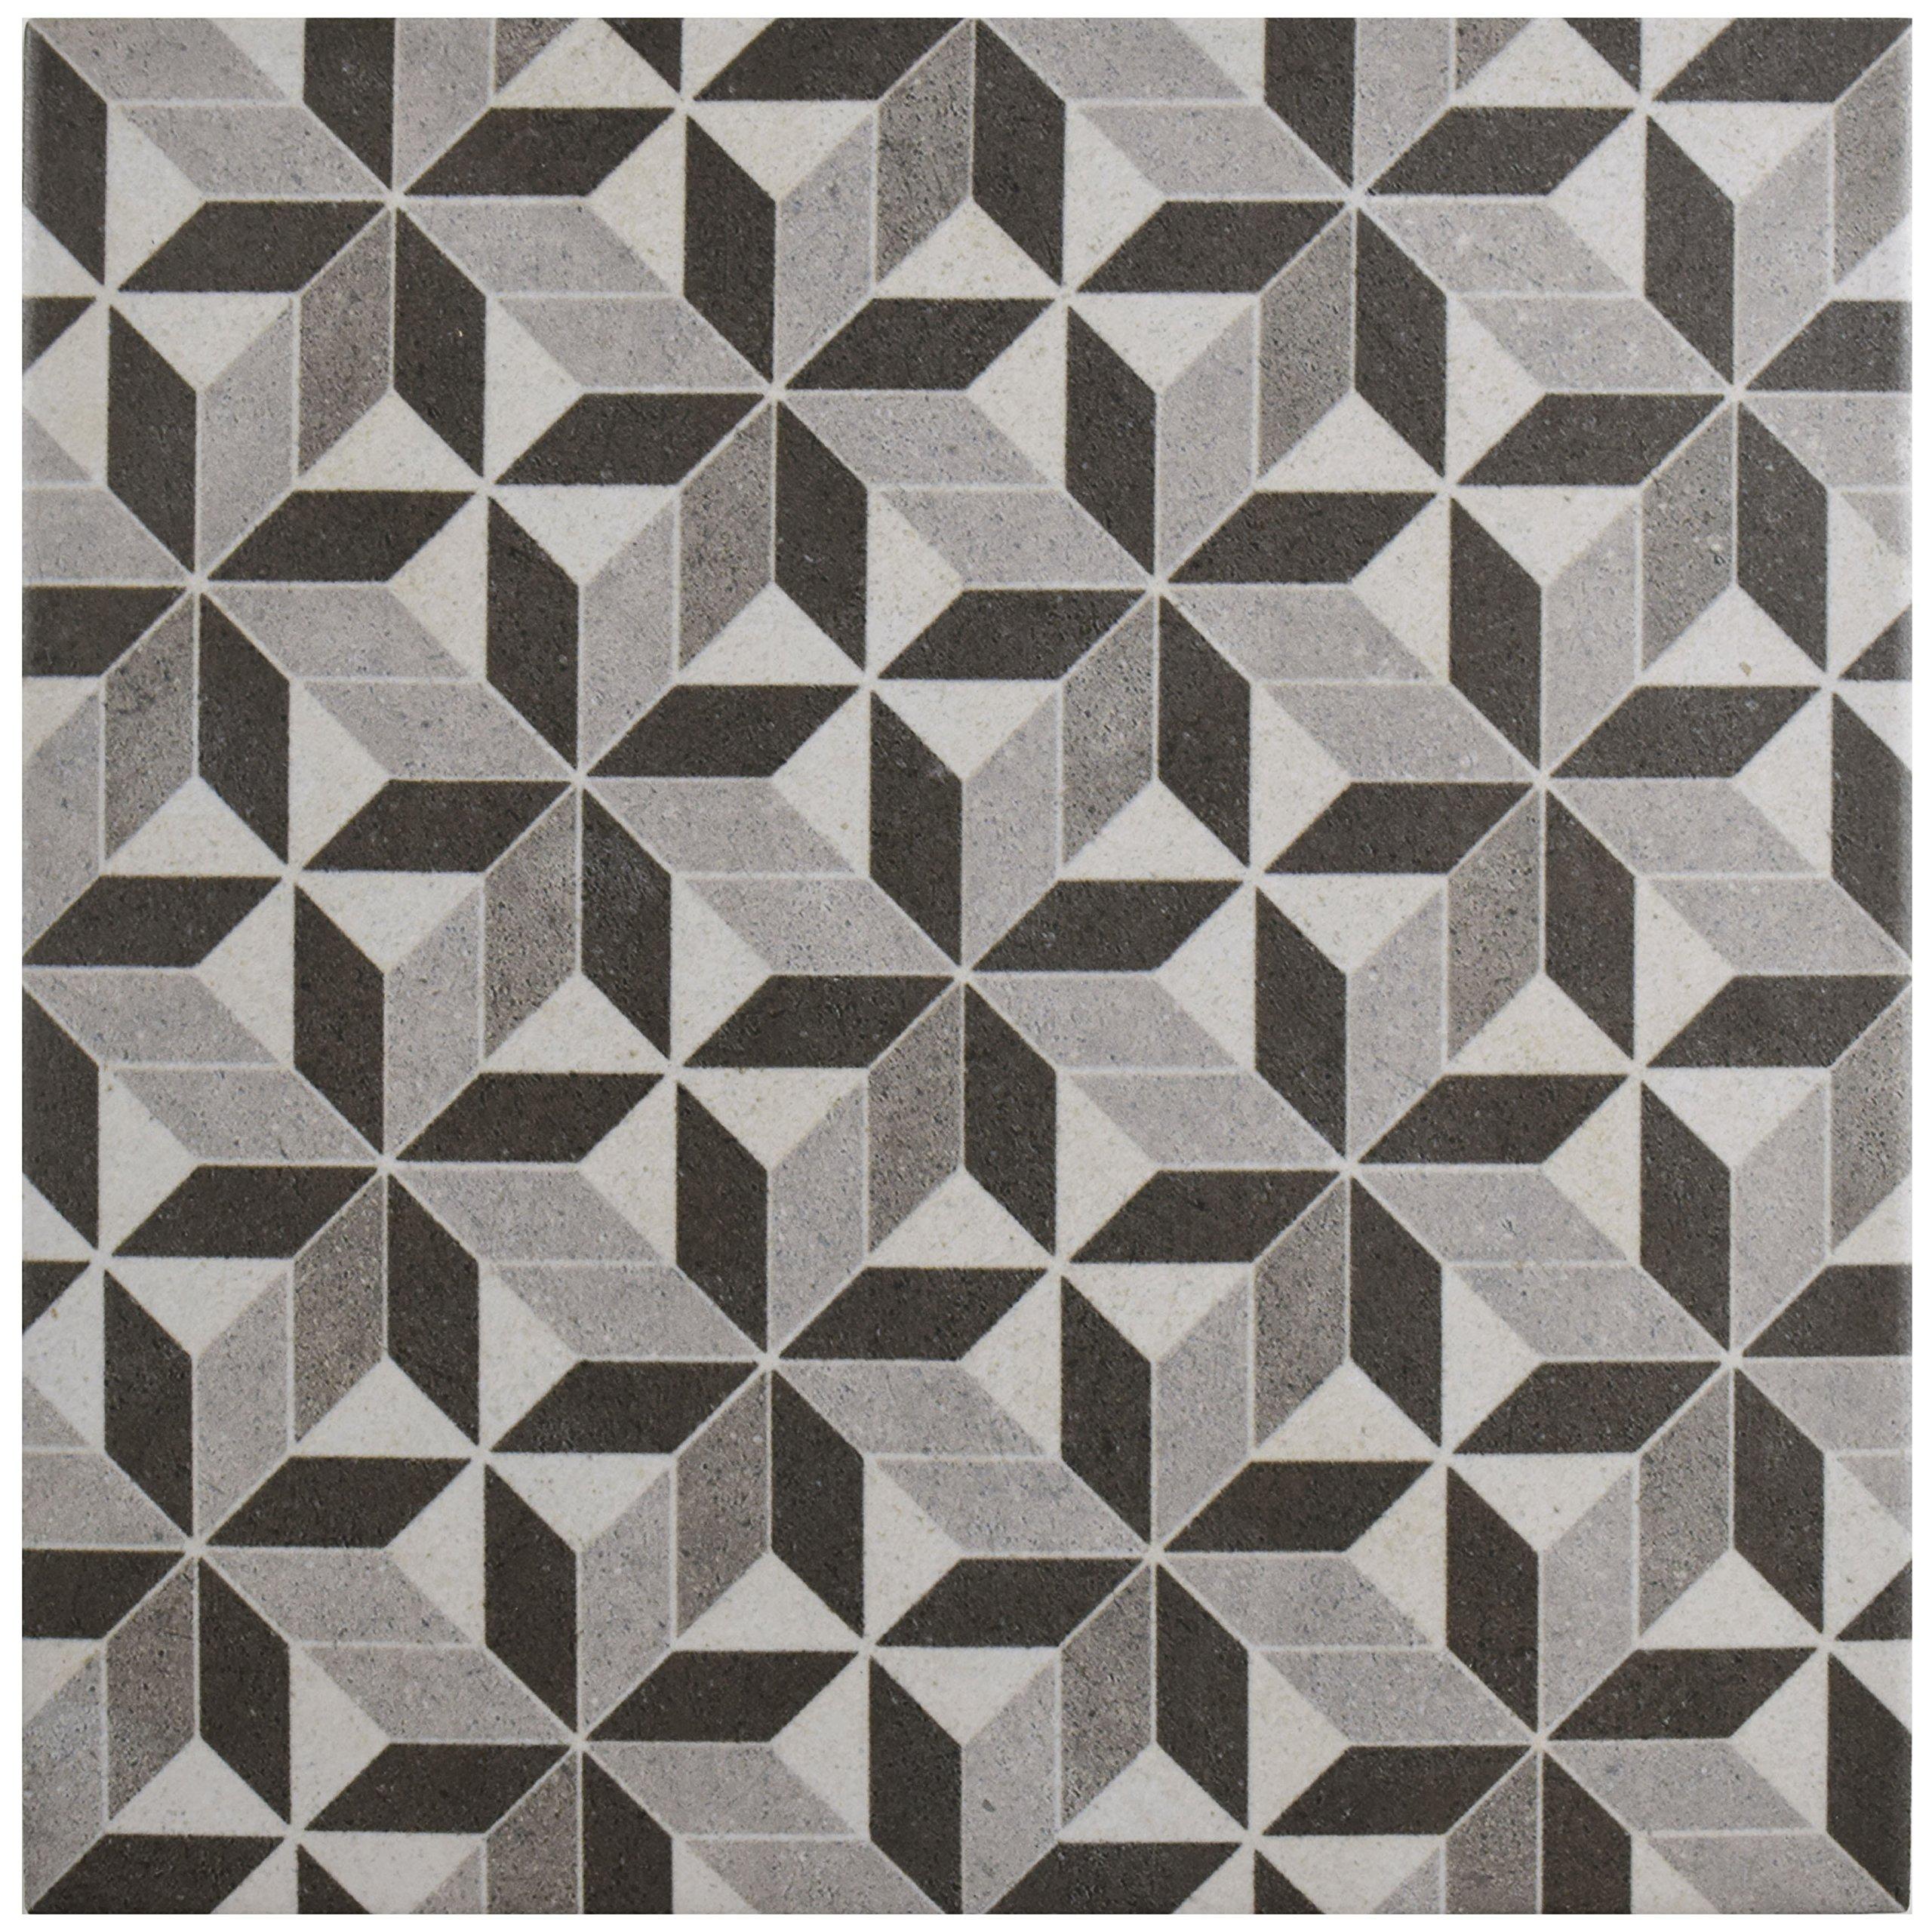 SomerTile FCD10VTK Verema Porcelain Floor and Wall Tile, 9.75'' x 9.75'', Grey